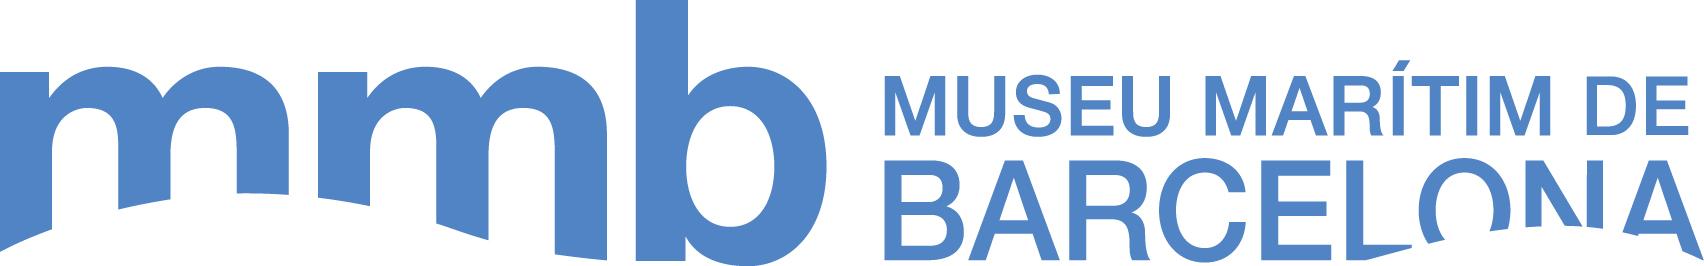 logo_mmb_color.jpg